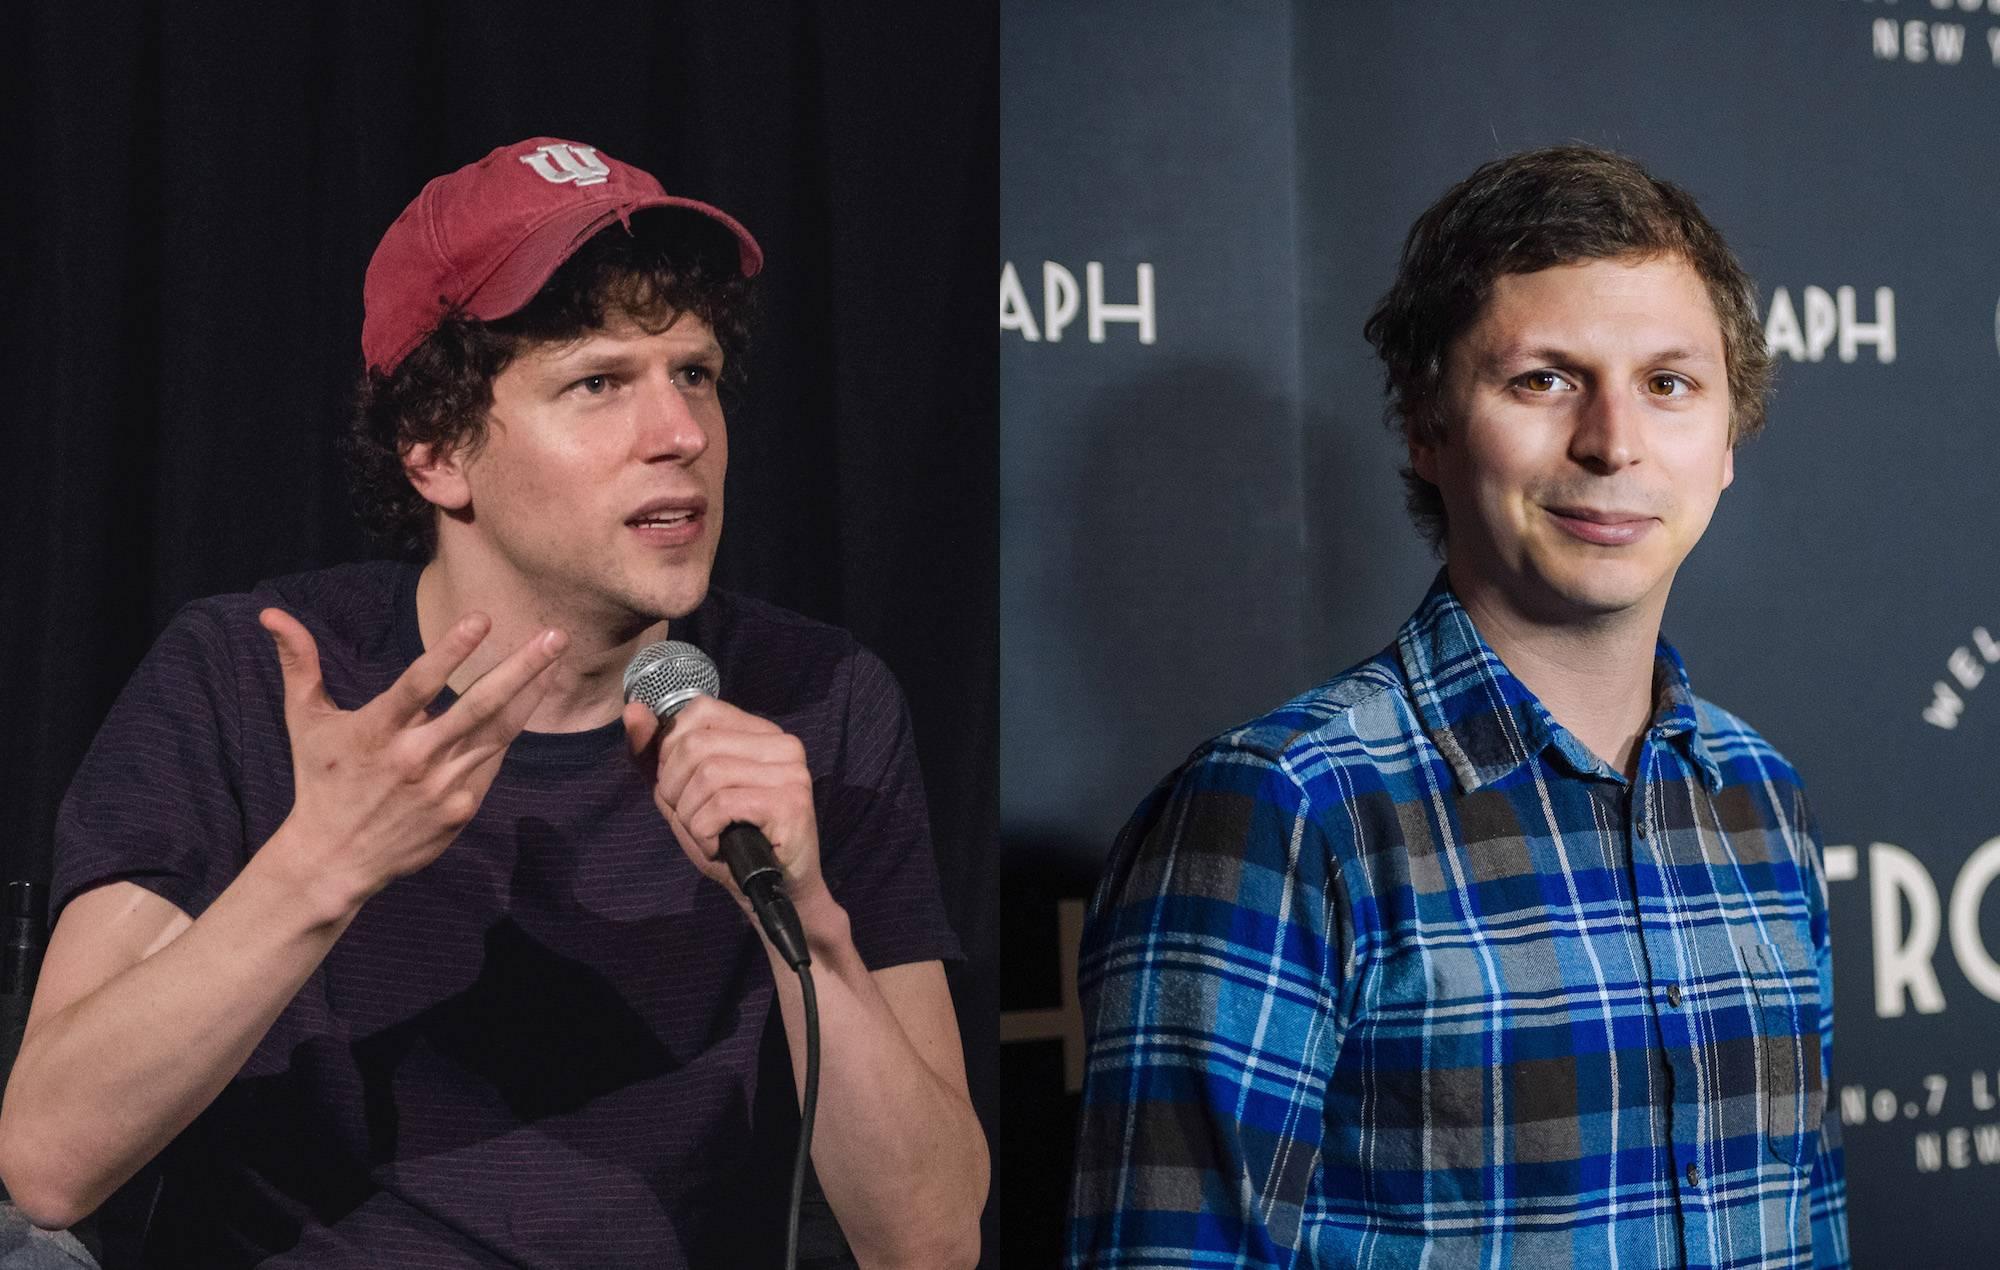 Michael Cera turned down role as Jesse Eisenberg's doppelgänger in 'Zombieland: Double Tap'